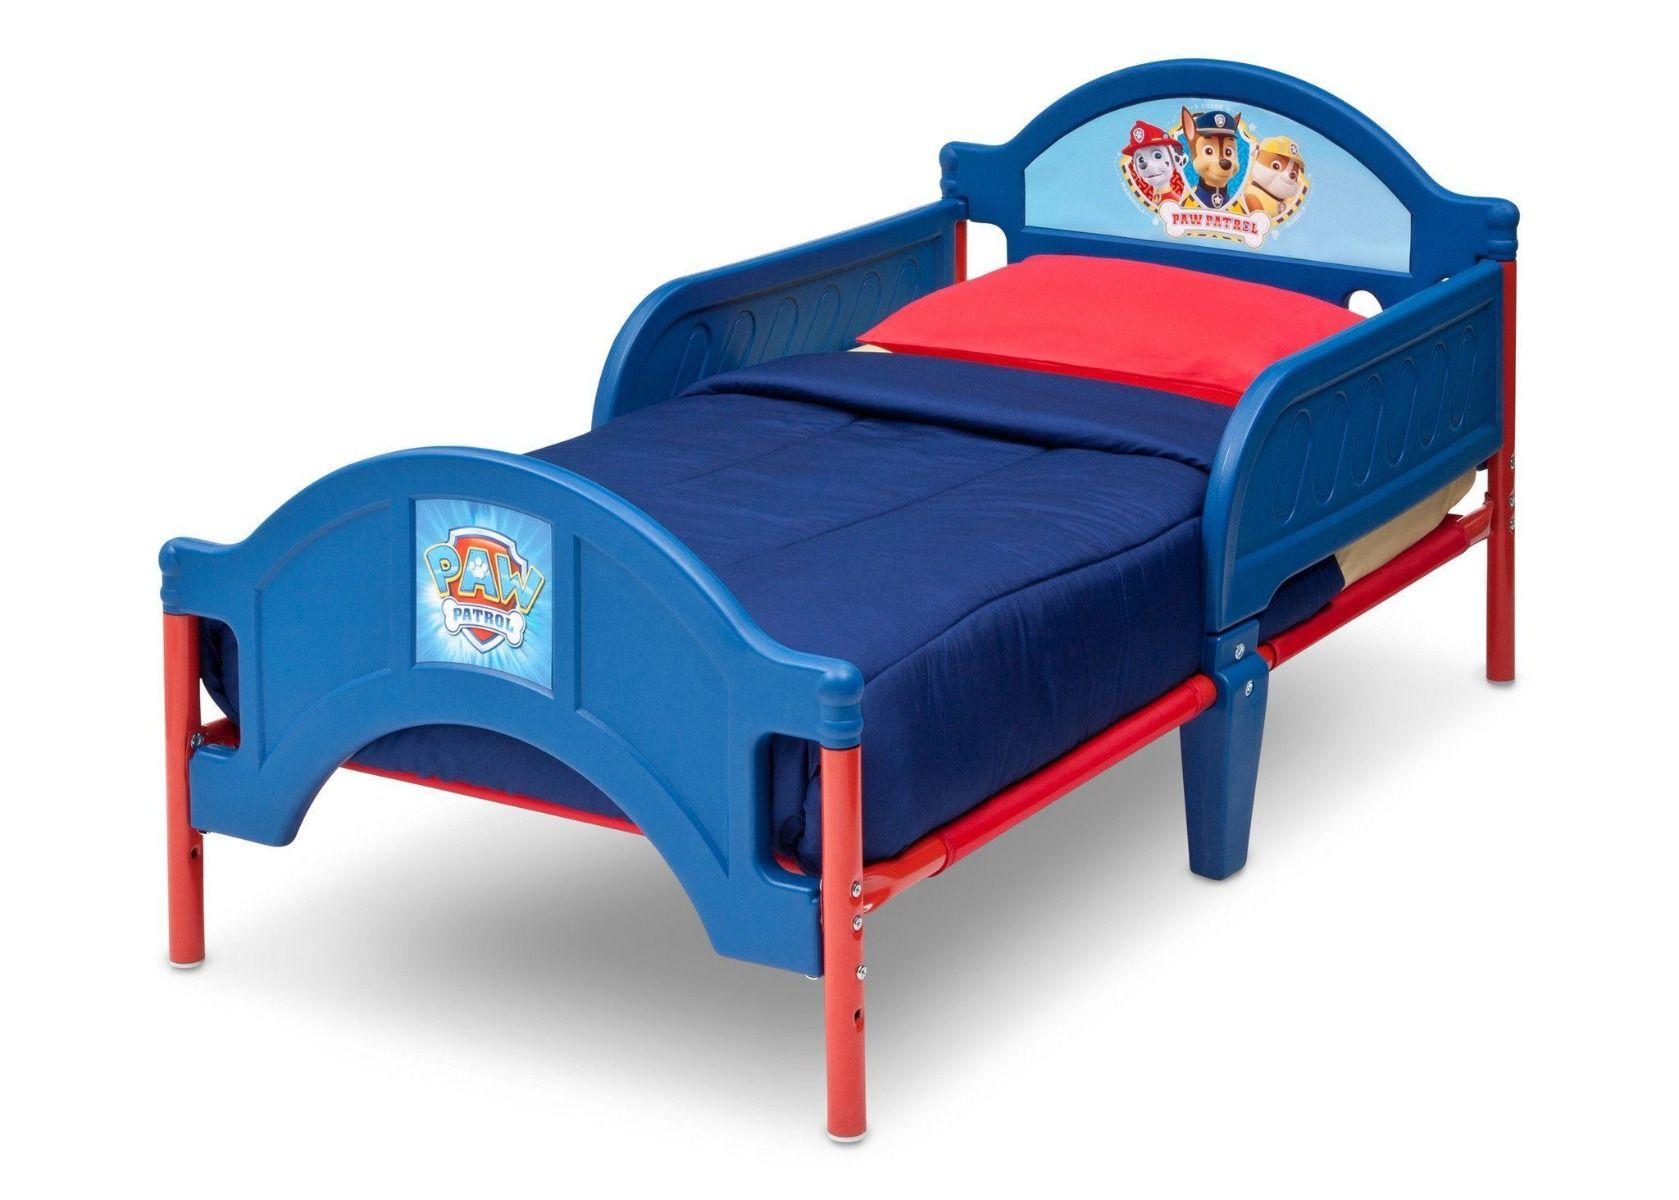 Nickelodeon Paw Patrol Plastic Toddler Bed Children BB86945PW_3